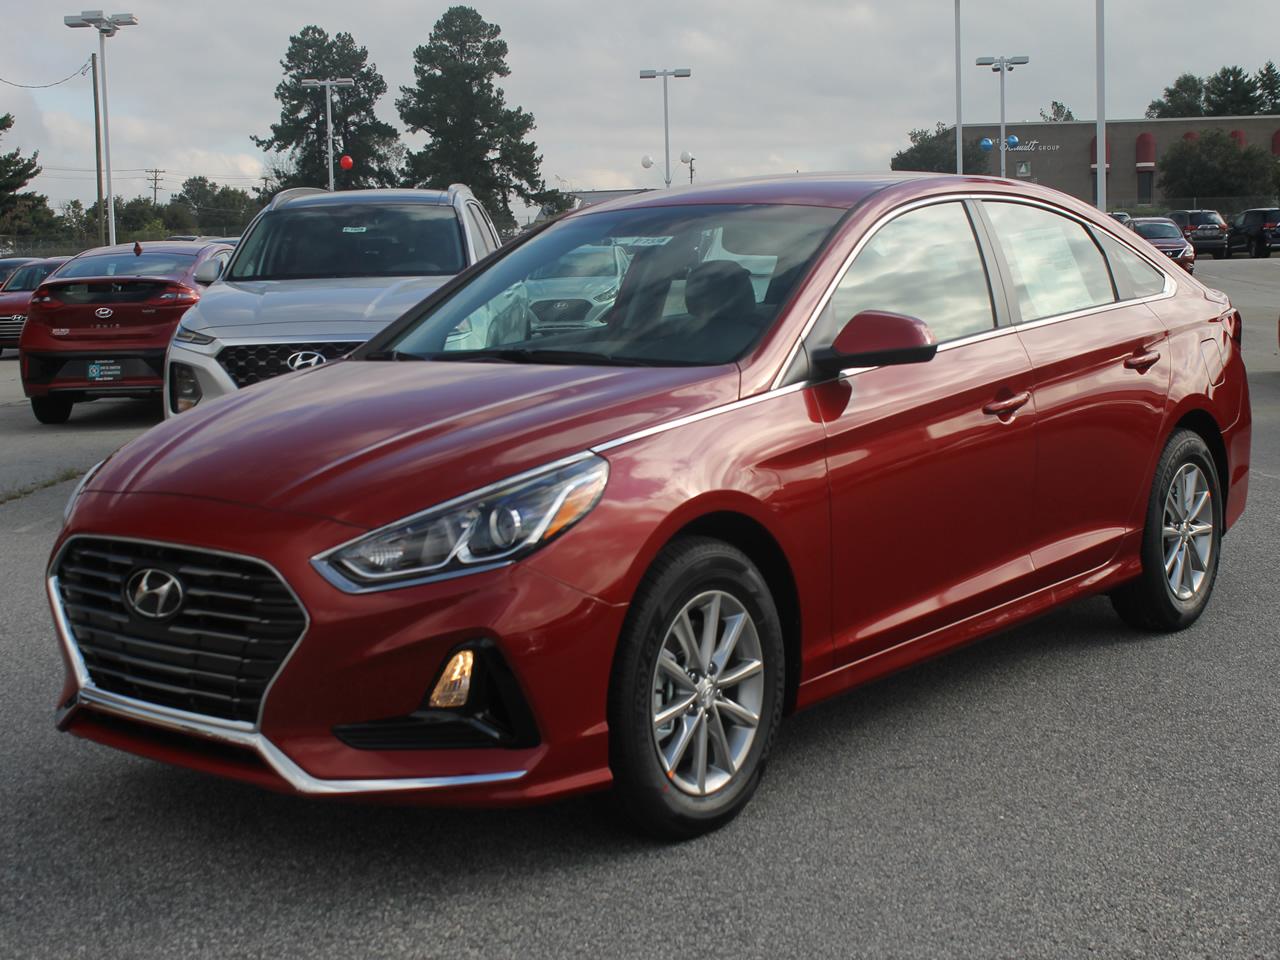 Dick Smith Hyundai >> NEW 2019 HYUNDAI SONATA SE VIN 5NPE24AF1KH744383 - Hyundai in Greenville | Hyundai Anderson ...